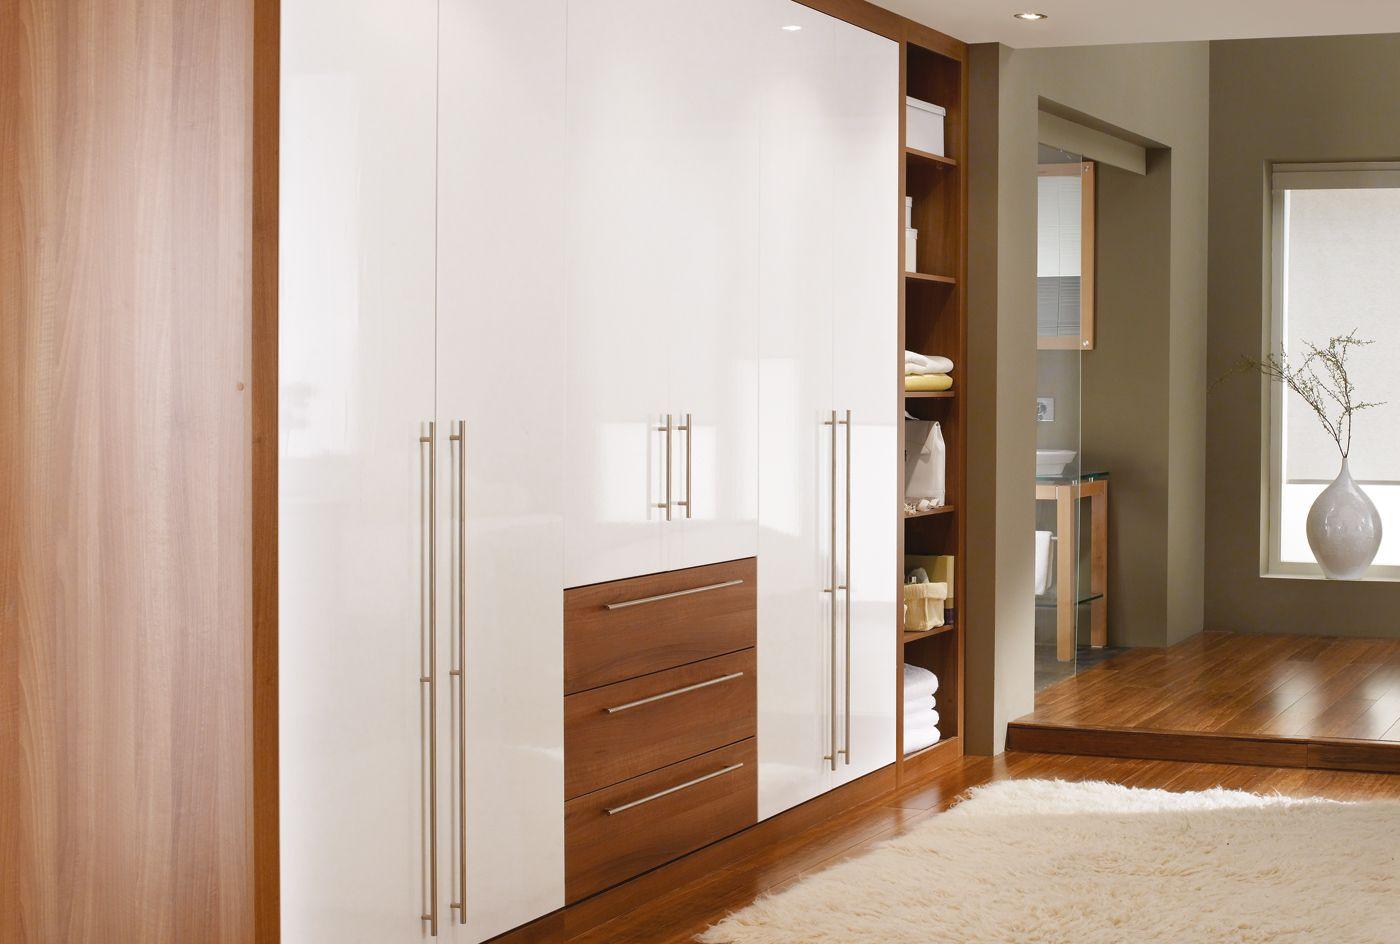 Cosmopolitan In Light Walnut And White Httpwwwsharpscouk - Light walnut bedroom furniture